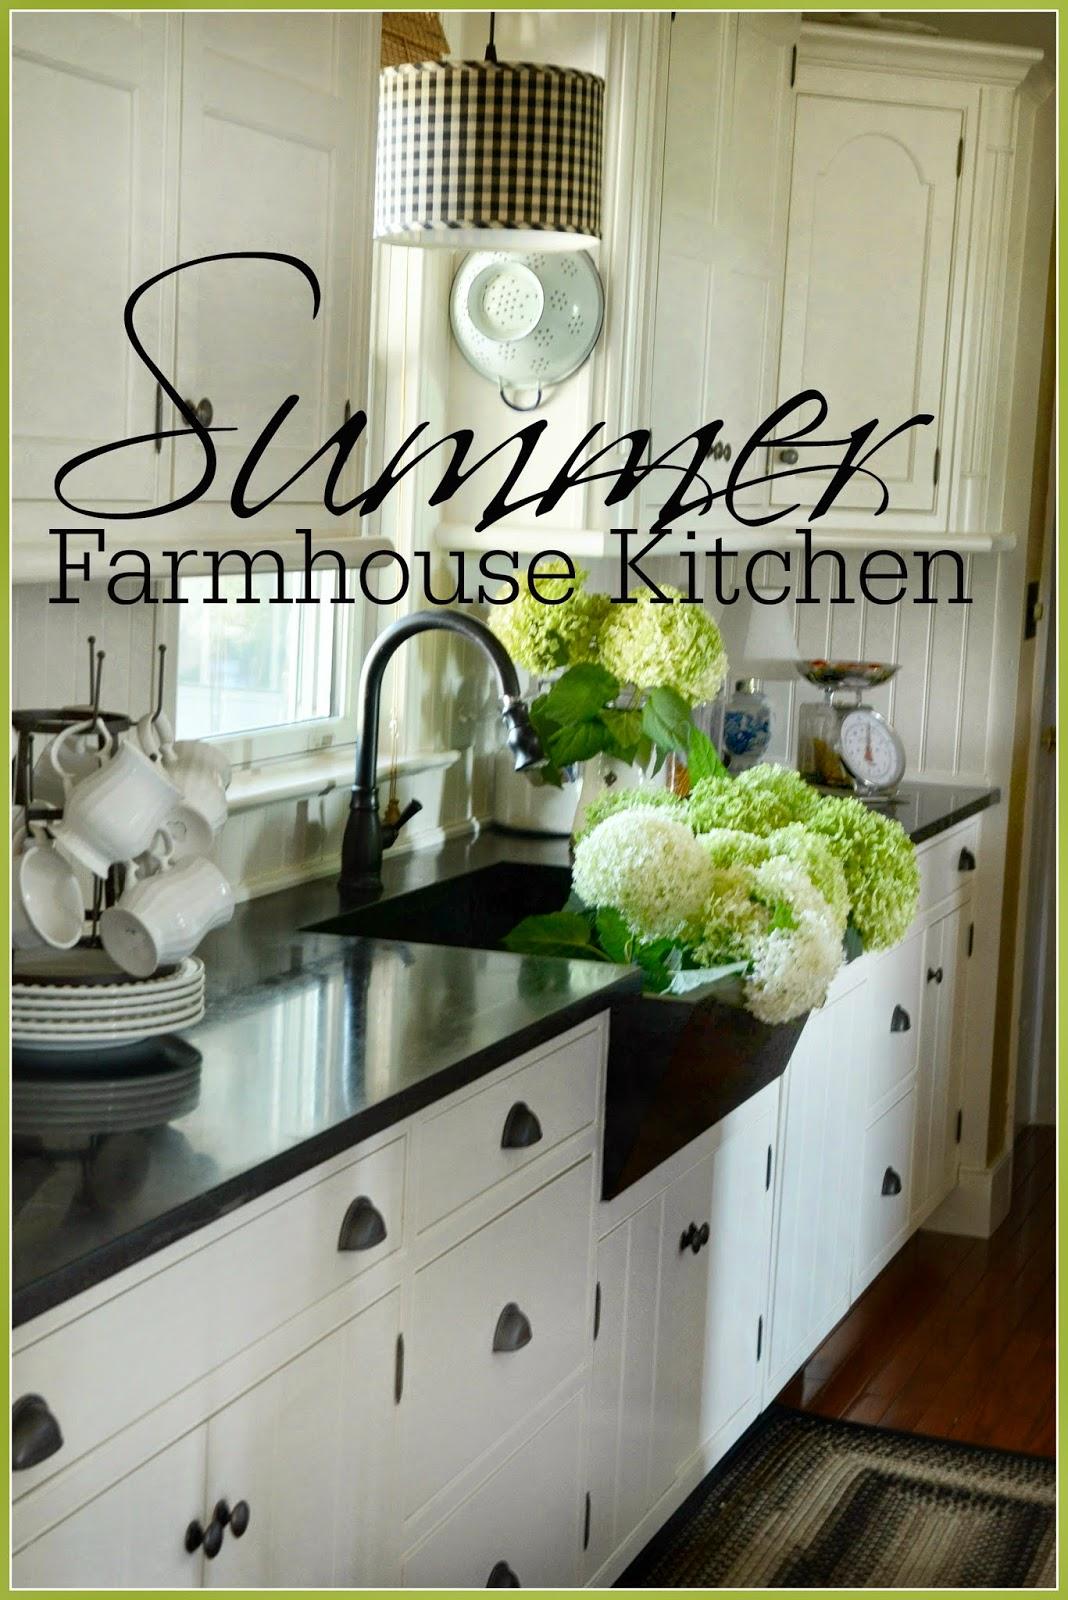 The Summer Farmhouse Kitchen : Mason Jar Rack